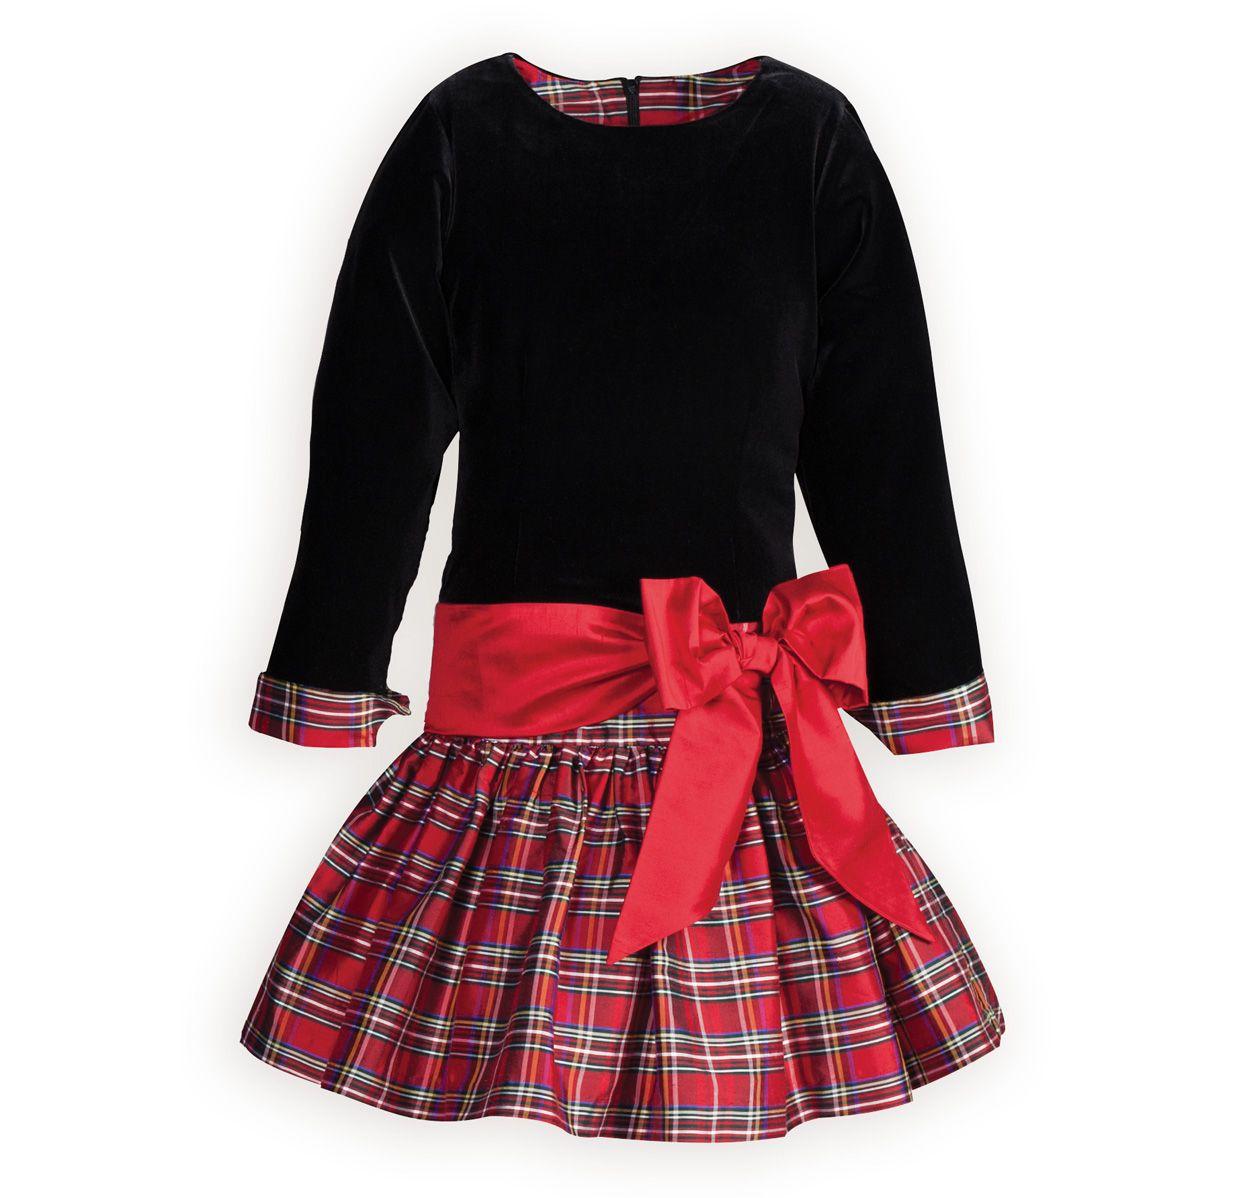 b615931af1f41 Christmas Plaid Drop-Waist Girls Dress | mad for plaid | Girls ...